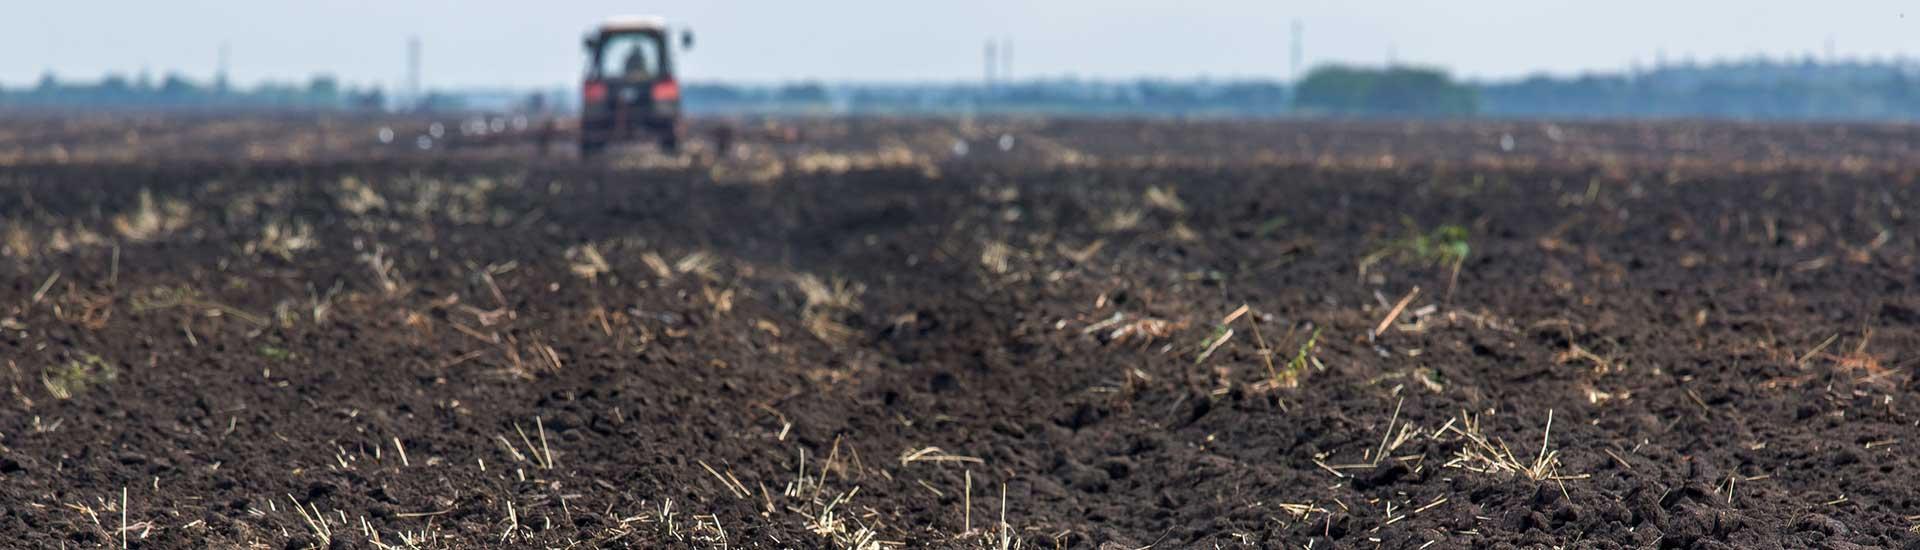 Land Reparation